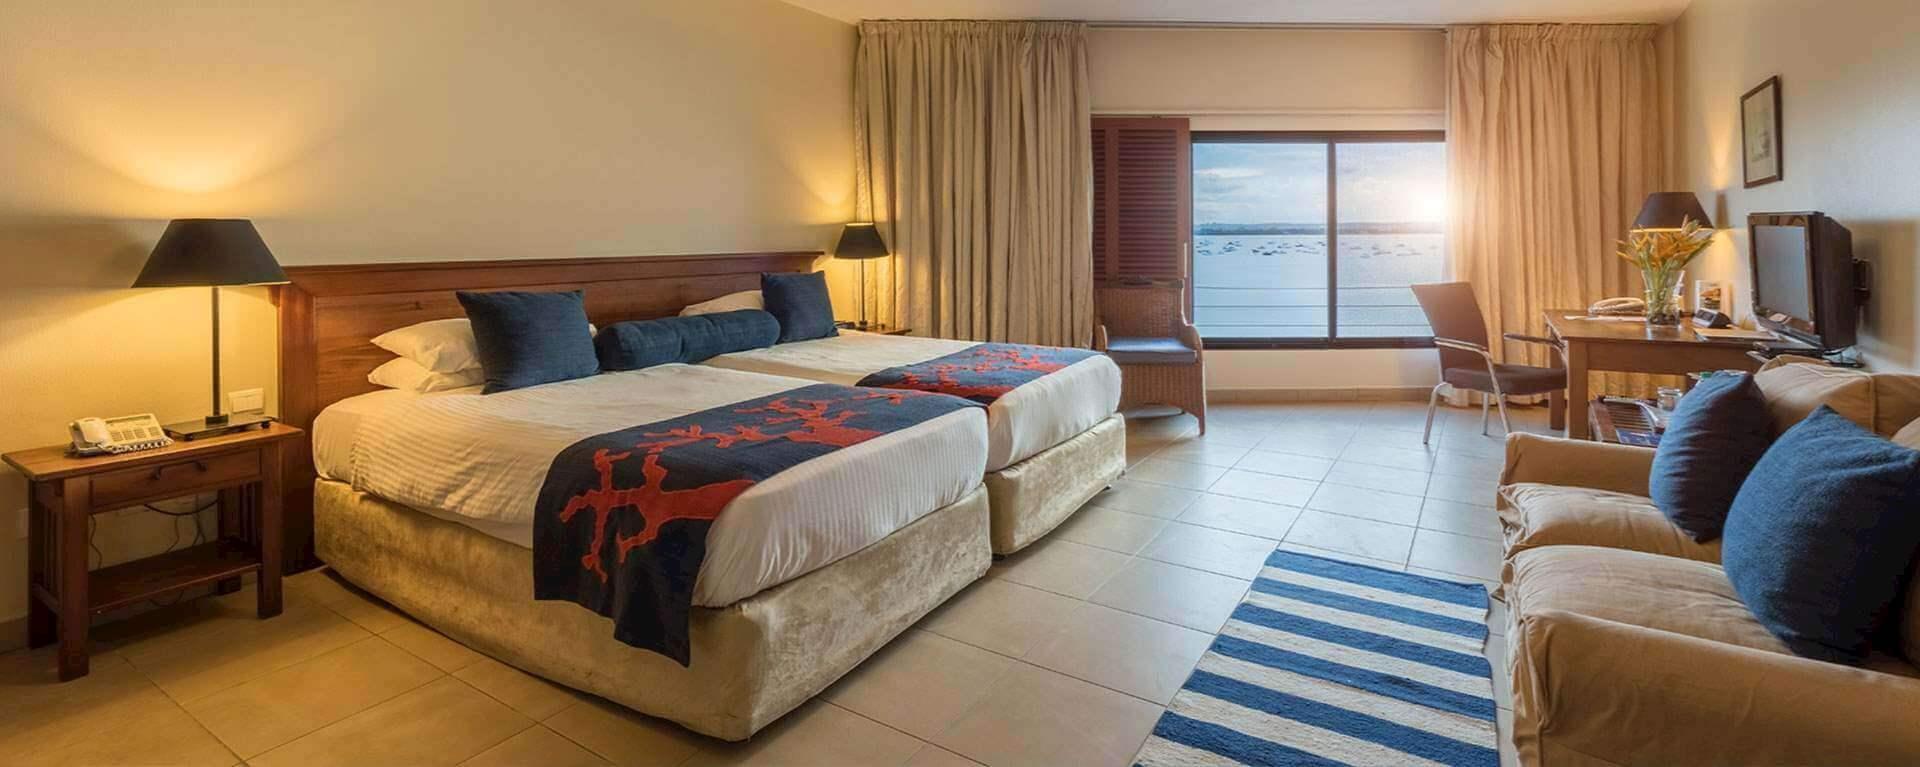 Best Western Coral Beach Hotel12